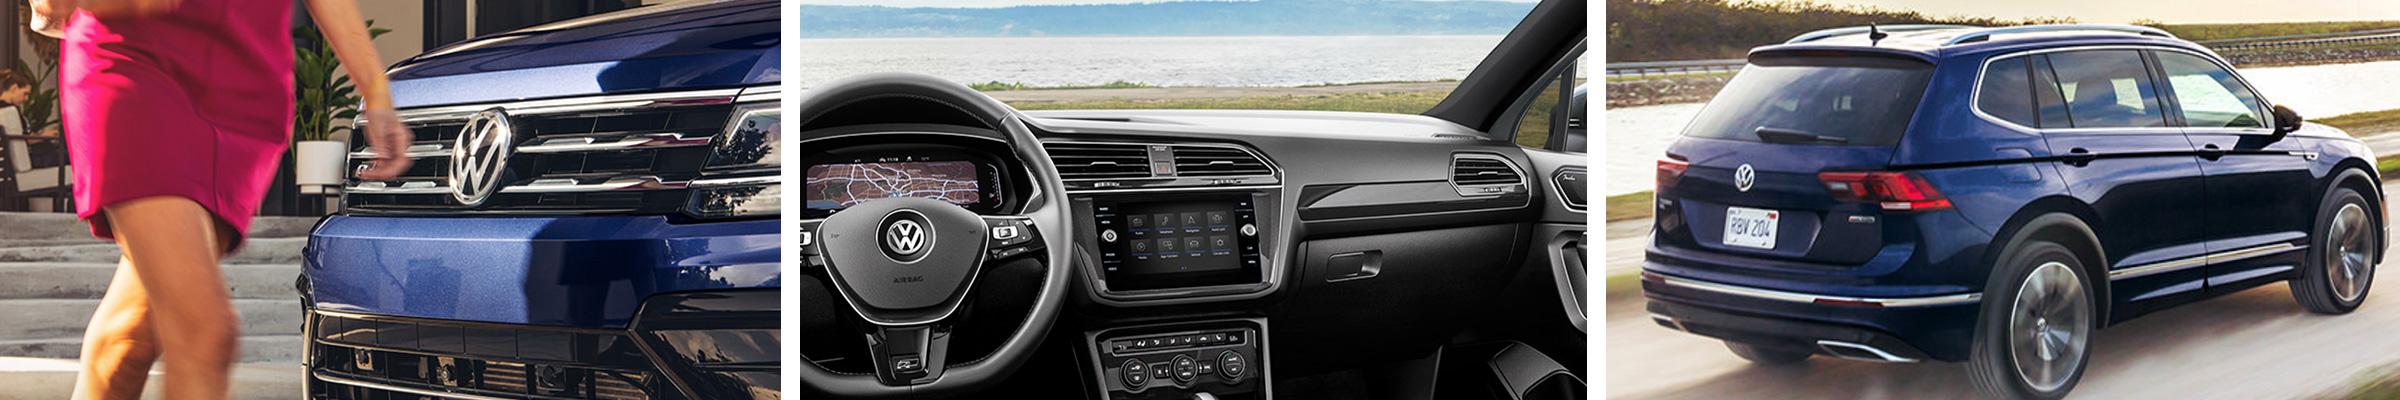 2021 Volkswagen Tiguan For Sale Near Daphne, AL